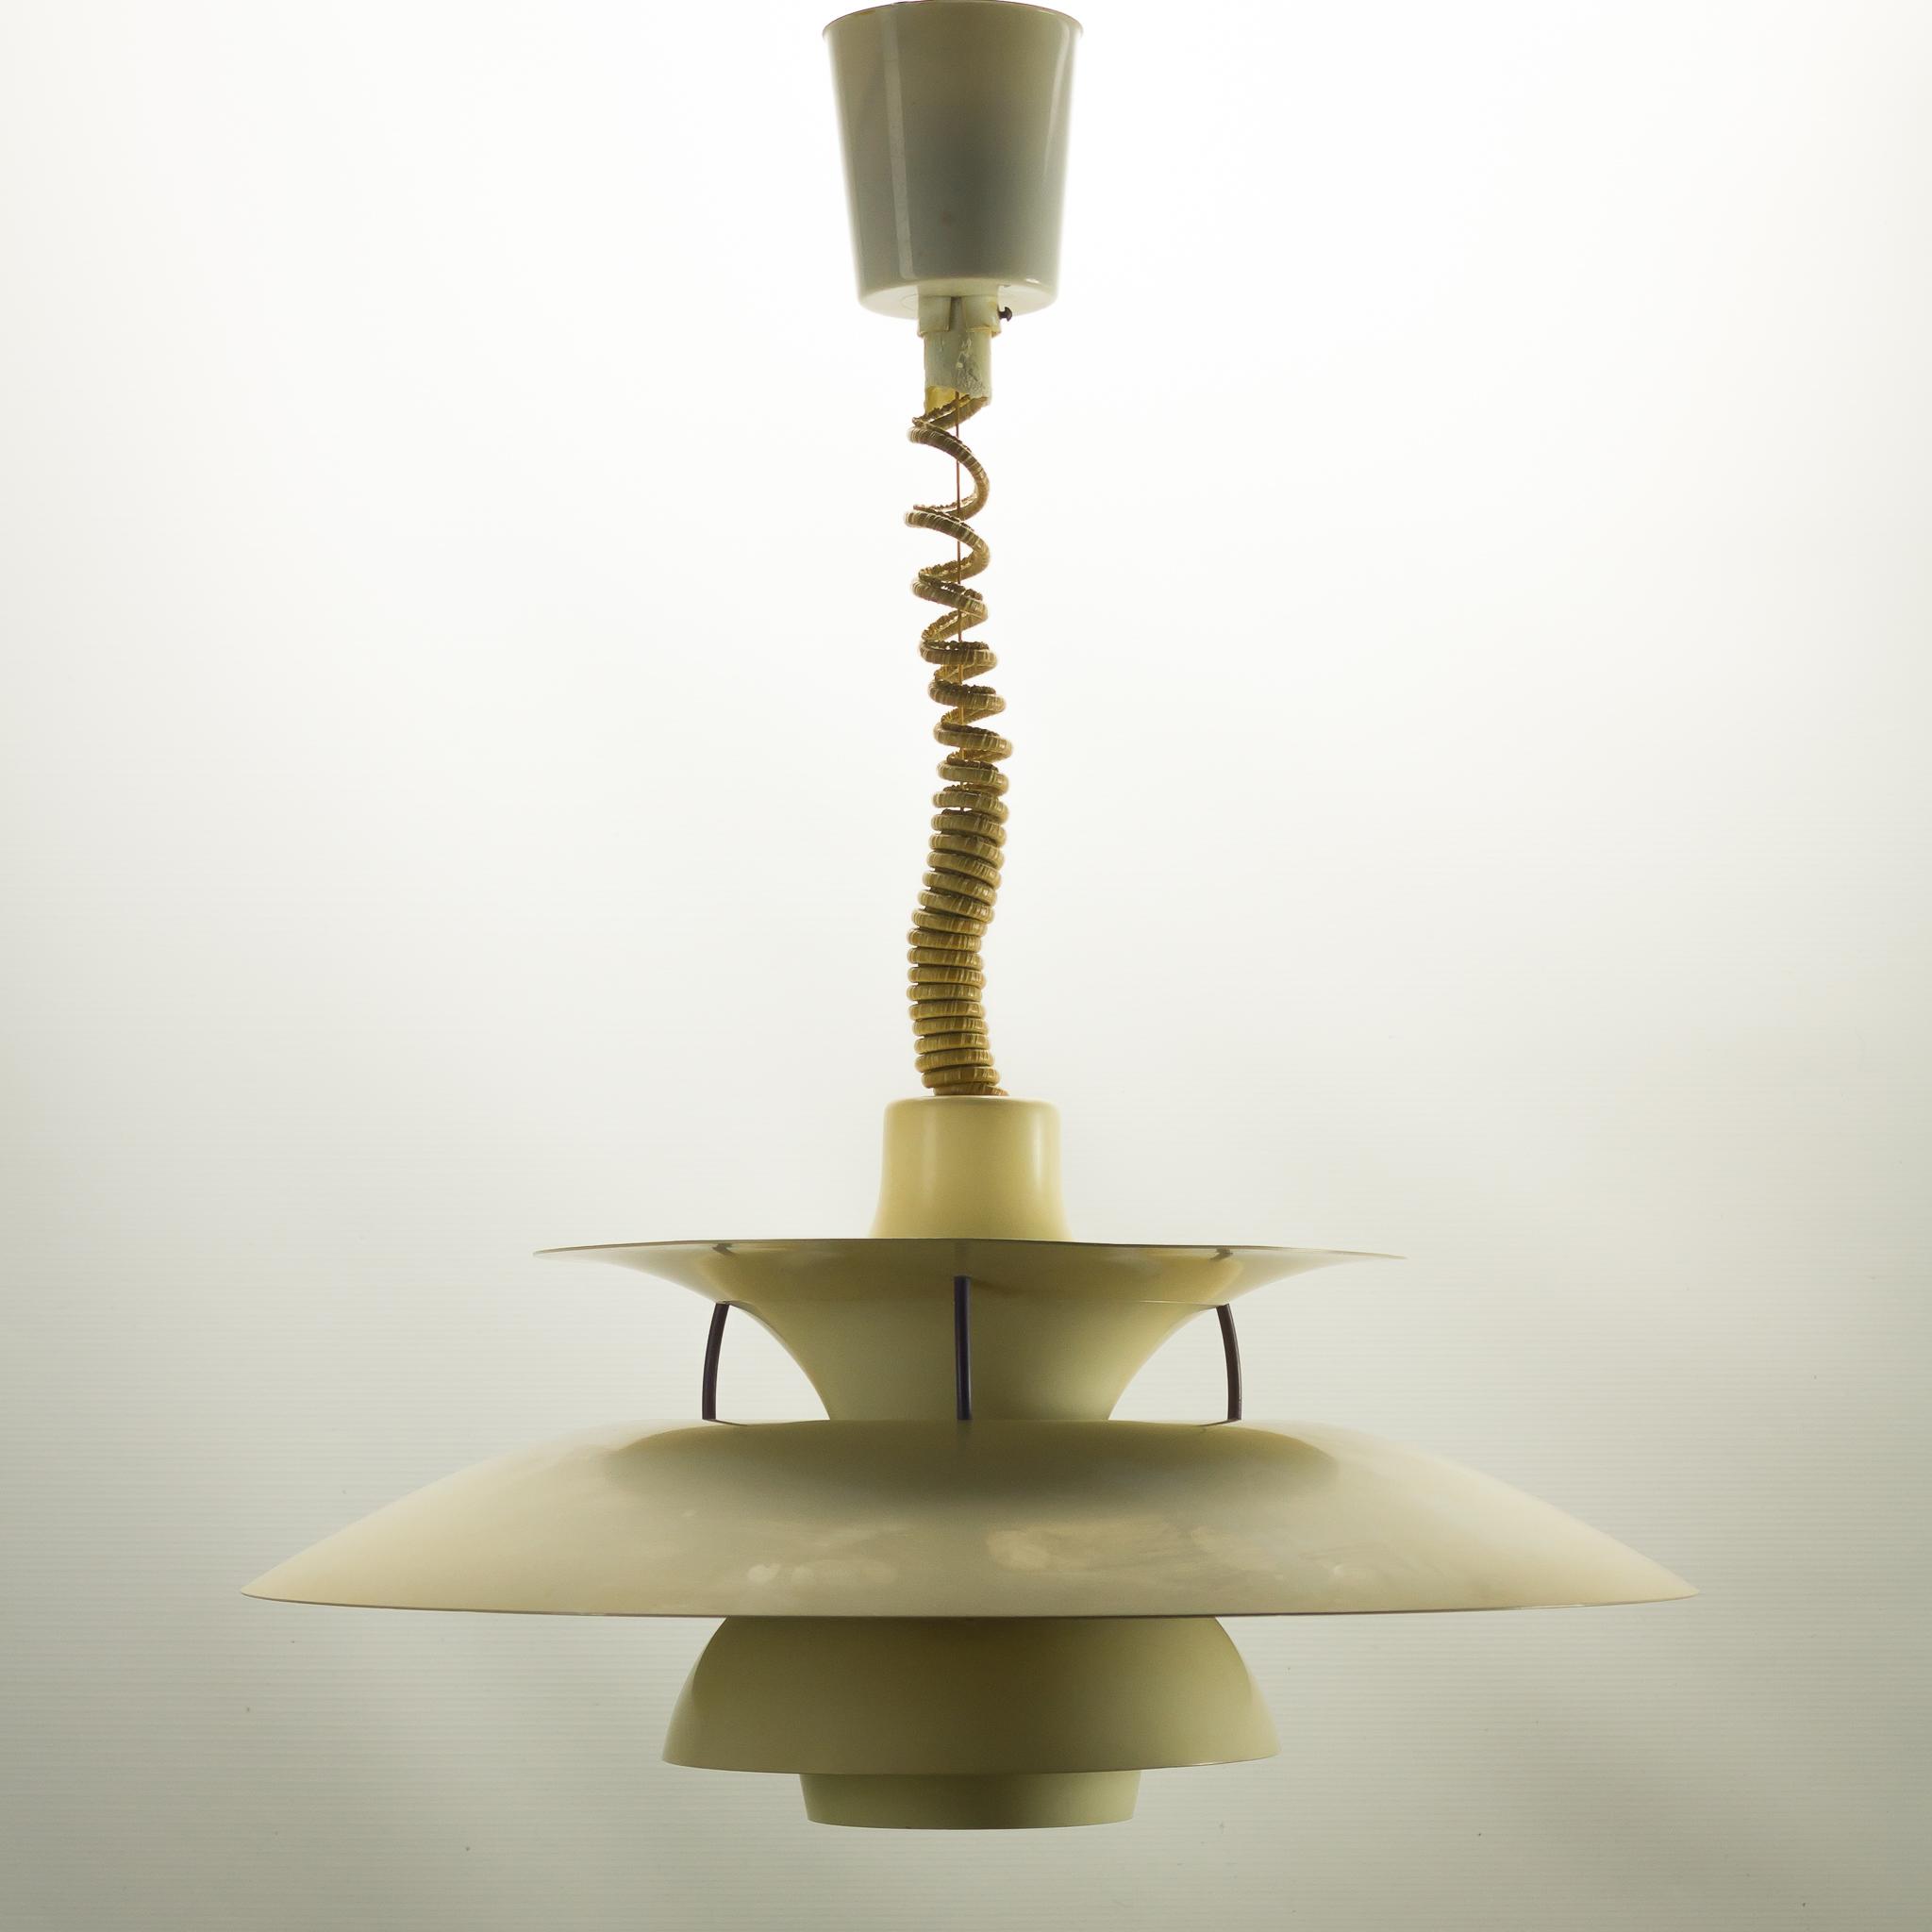 60 s poul henningsen ph 5 lamp by louis poulsen barbmama. Black Bedroom Furniture Sets. Home Design Ideas